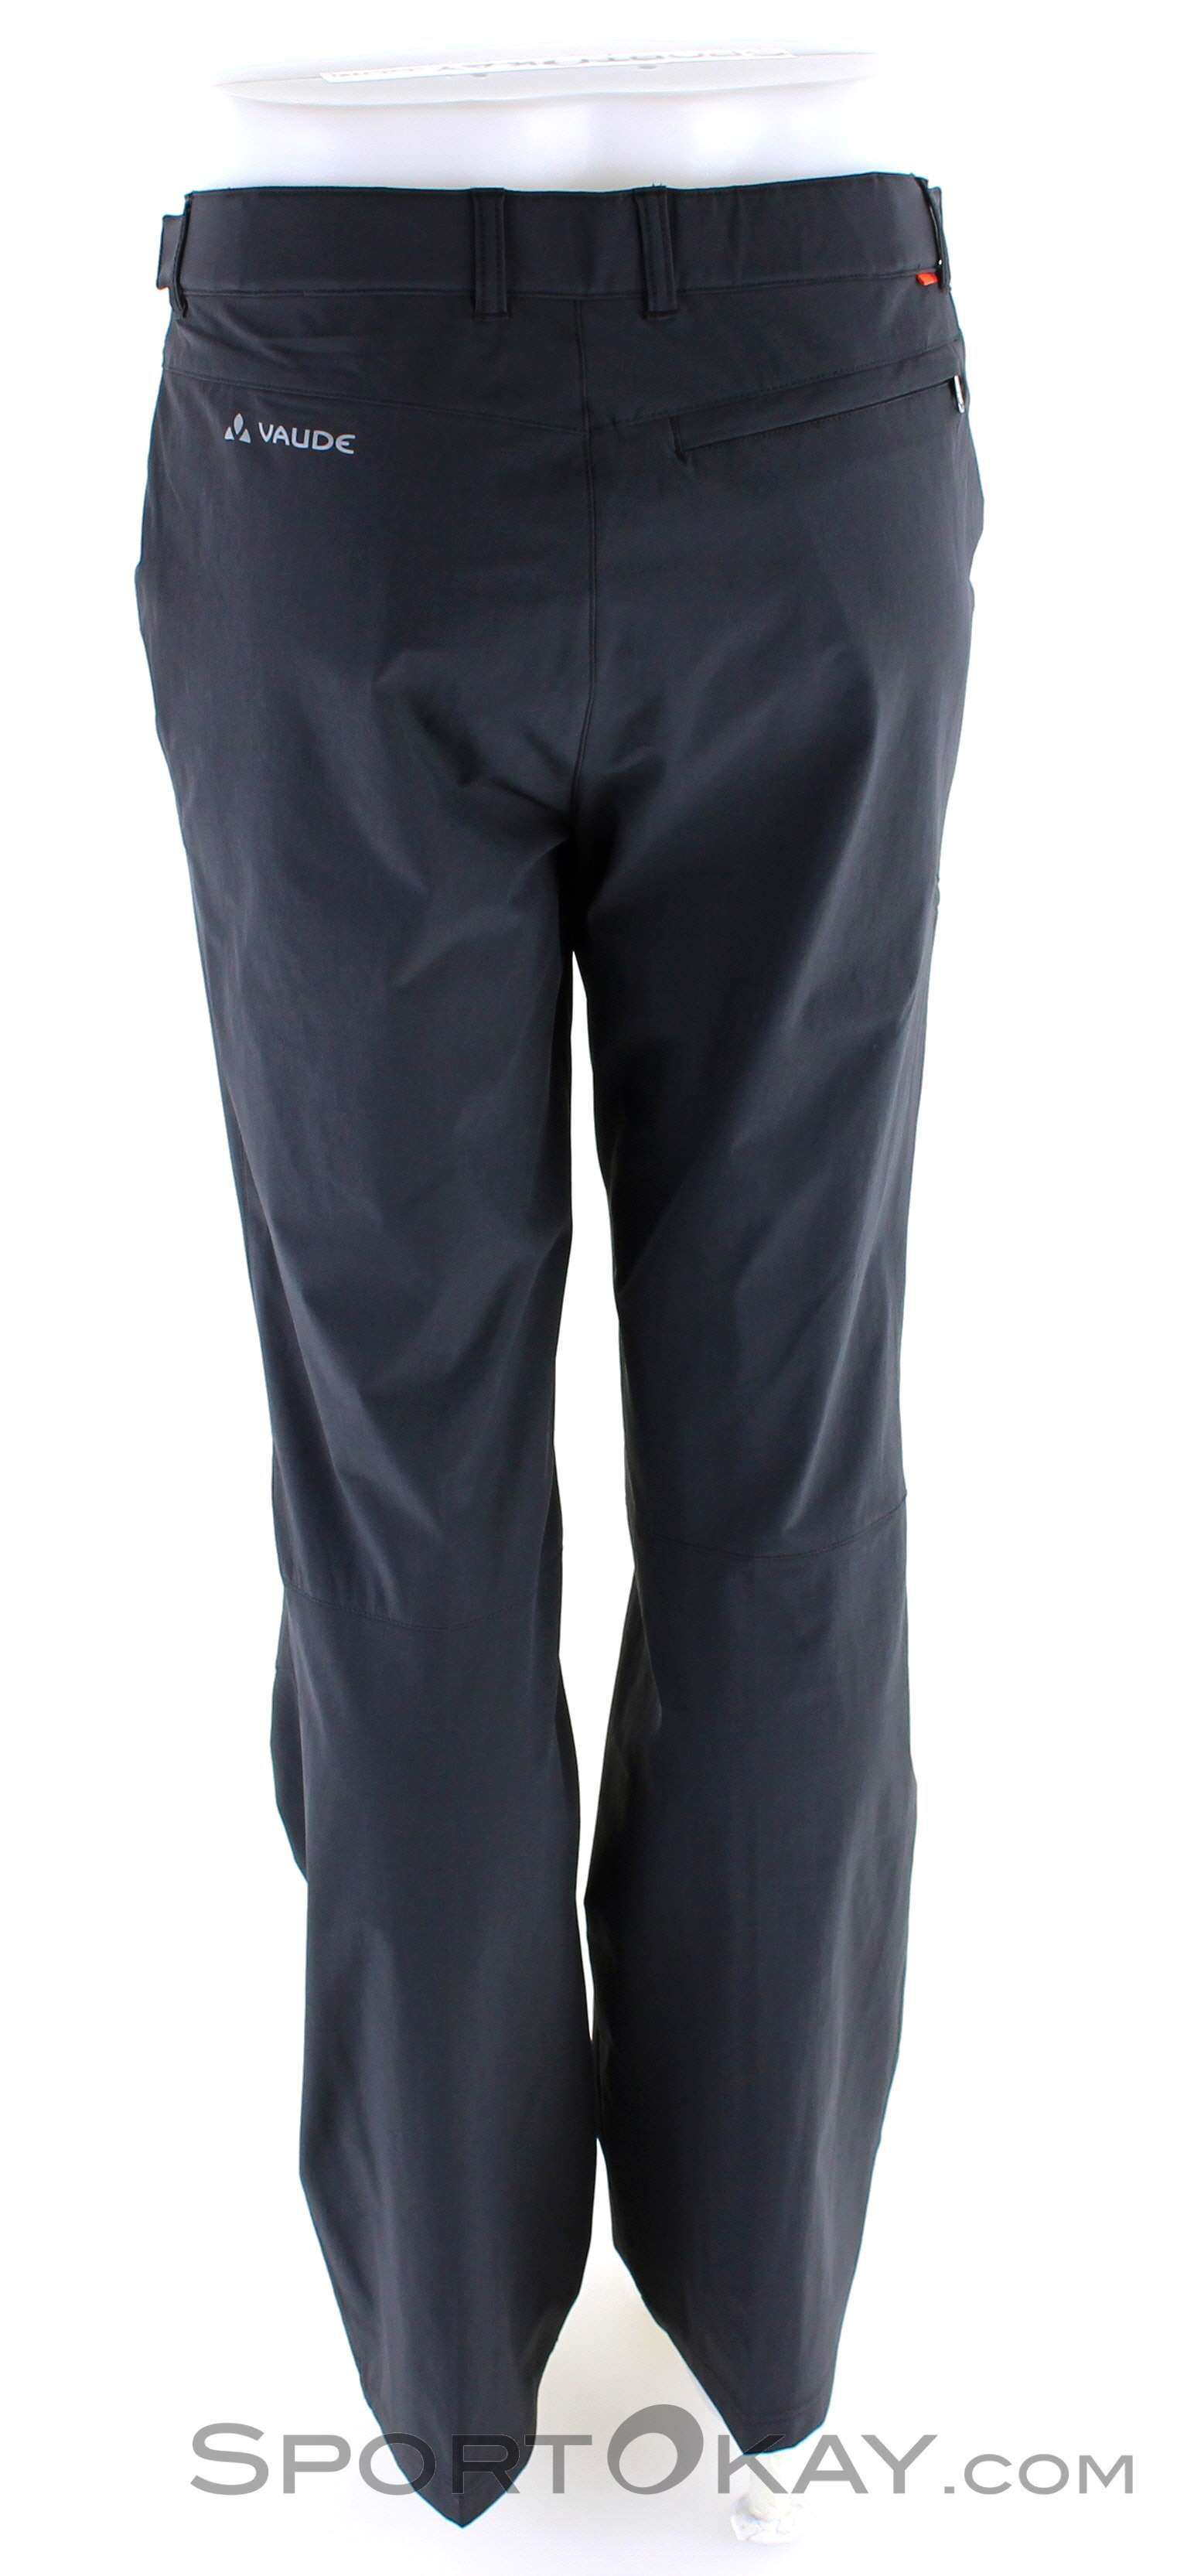 Vaude Uomo Pantaloni Farley Stretch II 04574